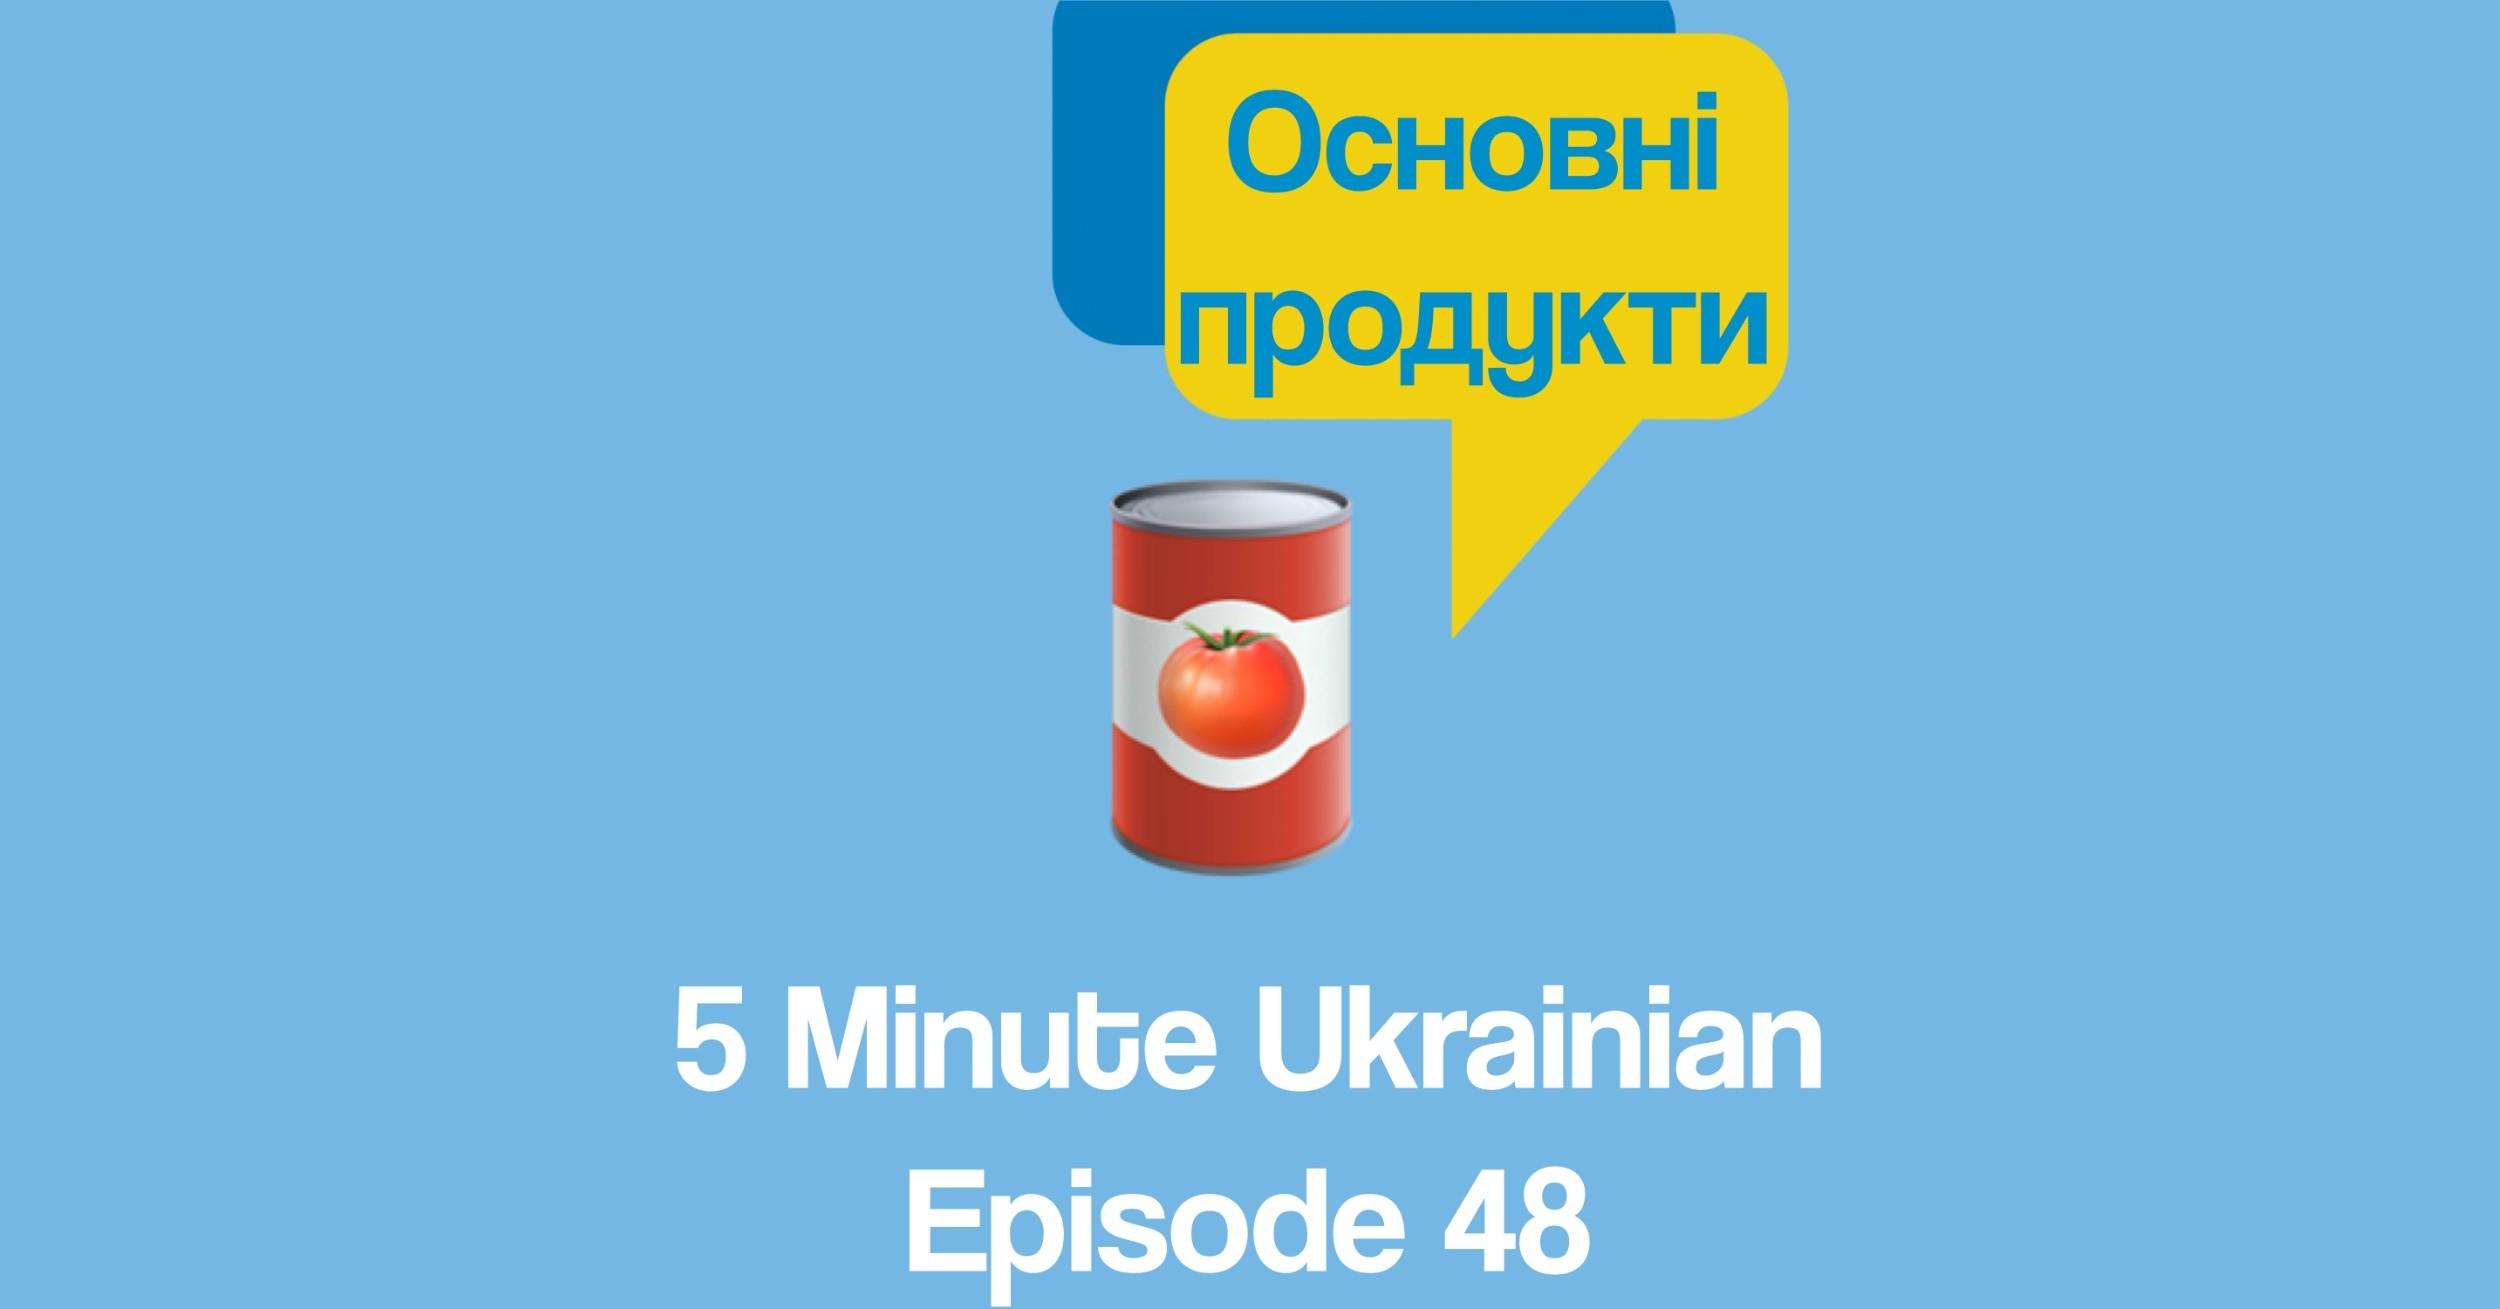 staple food in Ukrainian